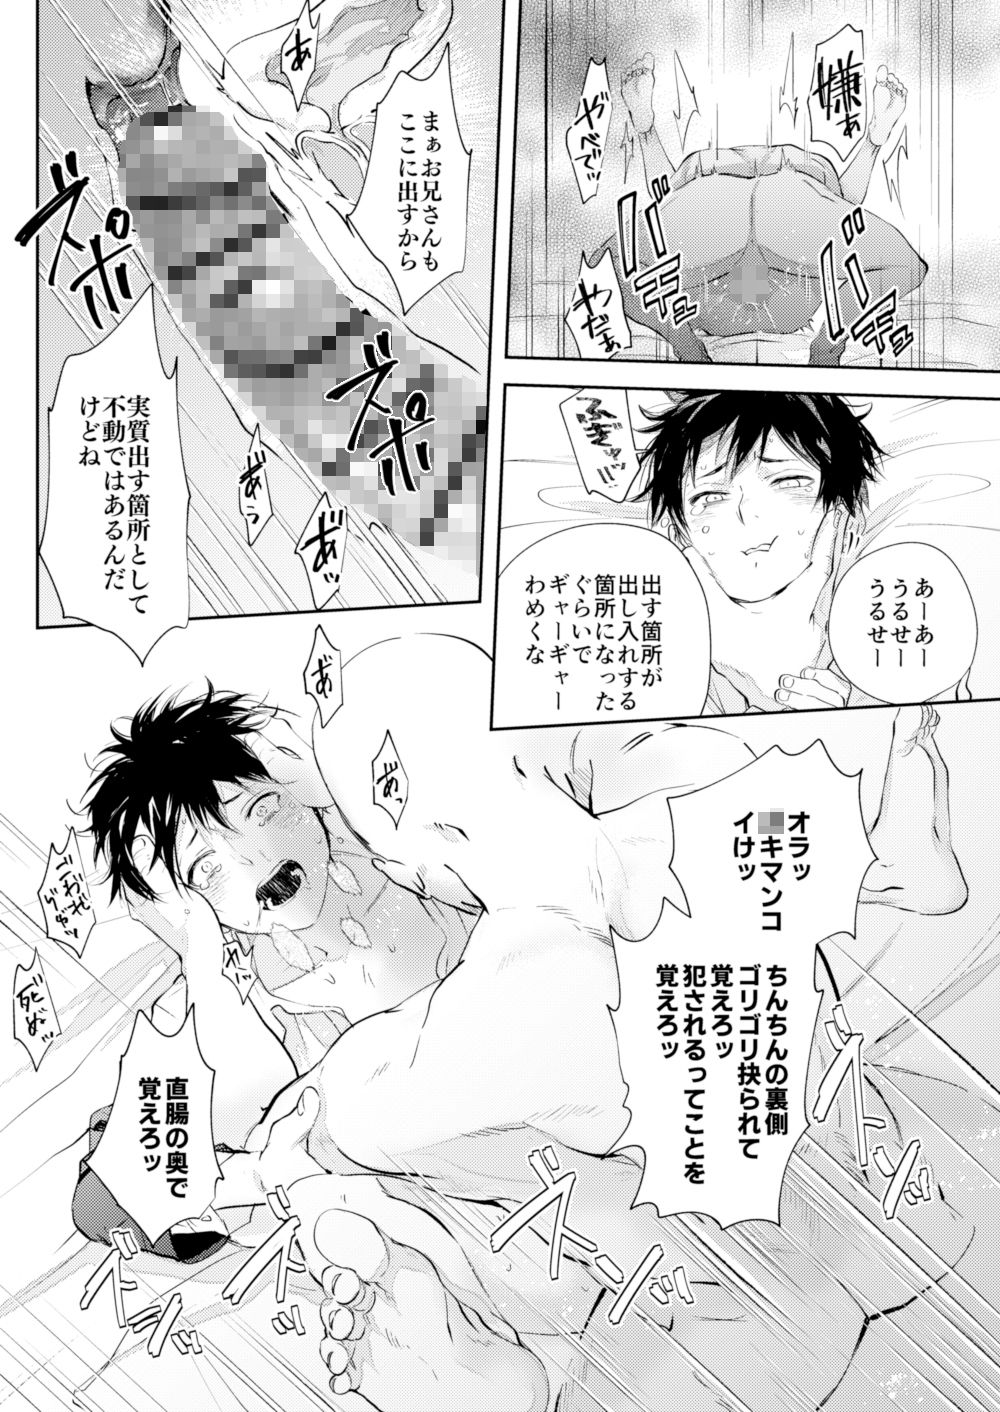 Sensiteve-モノクロらくがきまとめ画像no.5